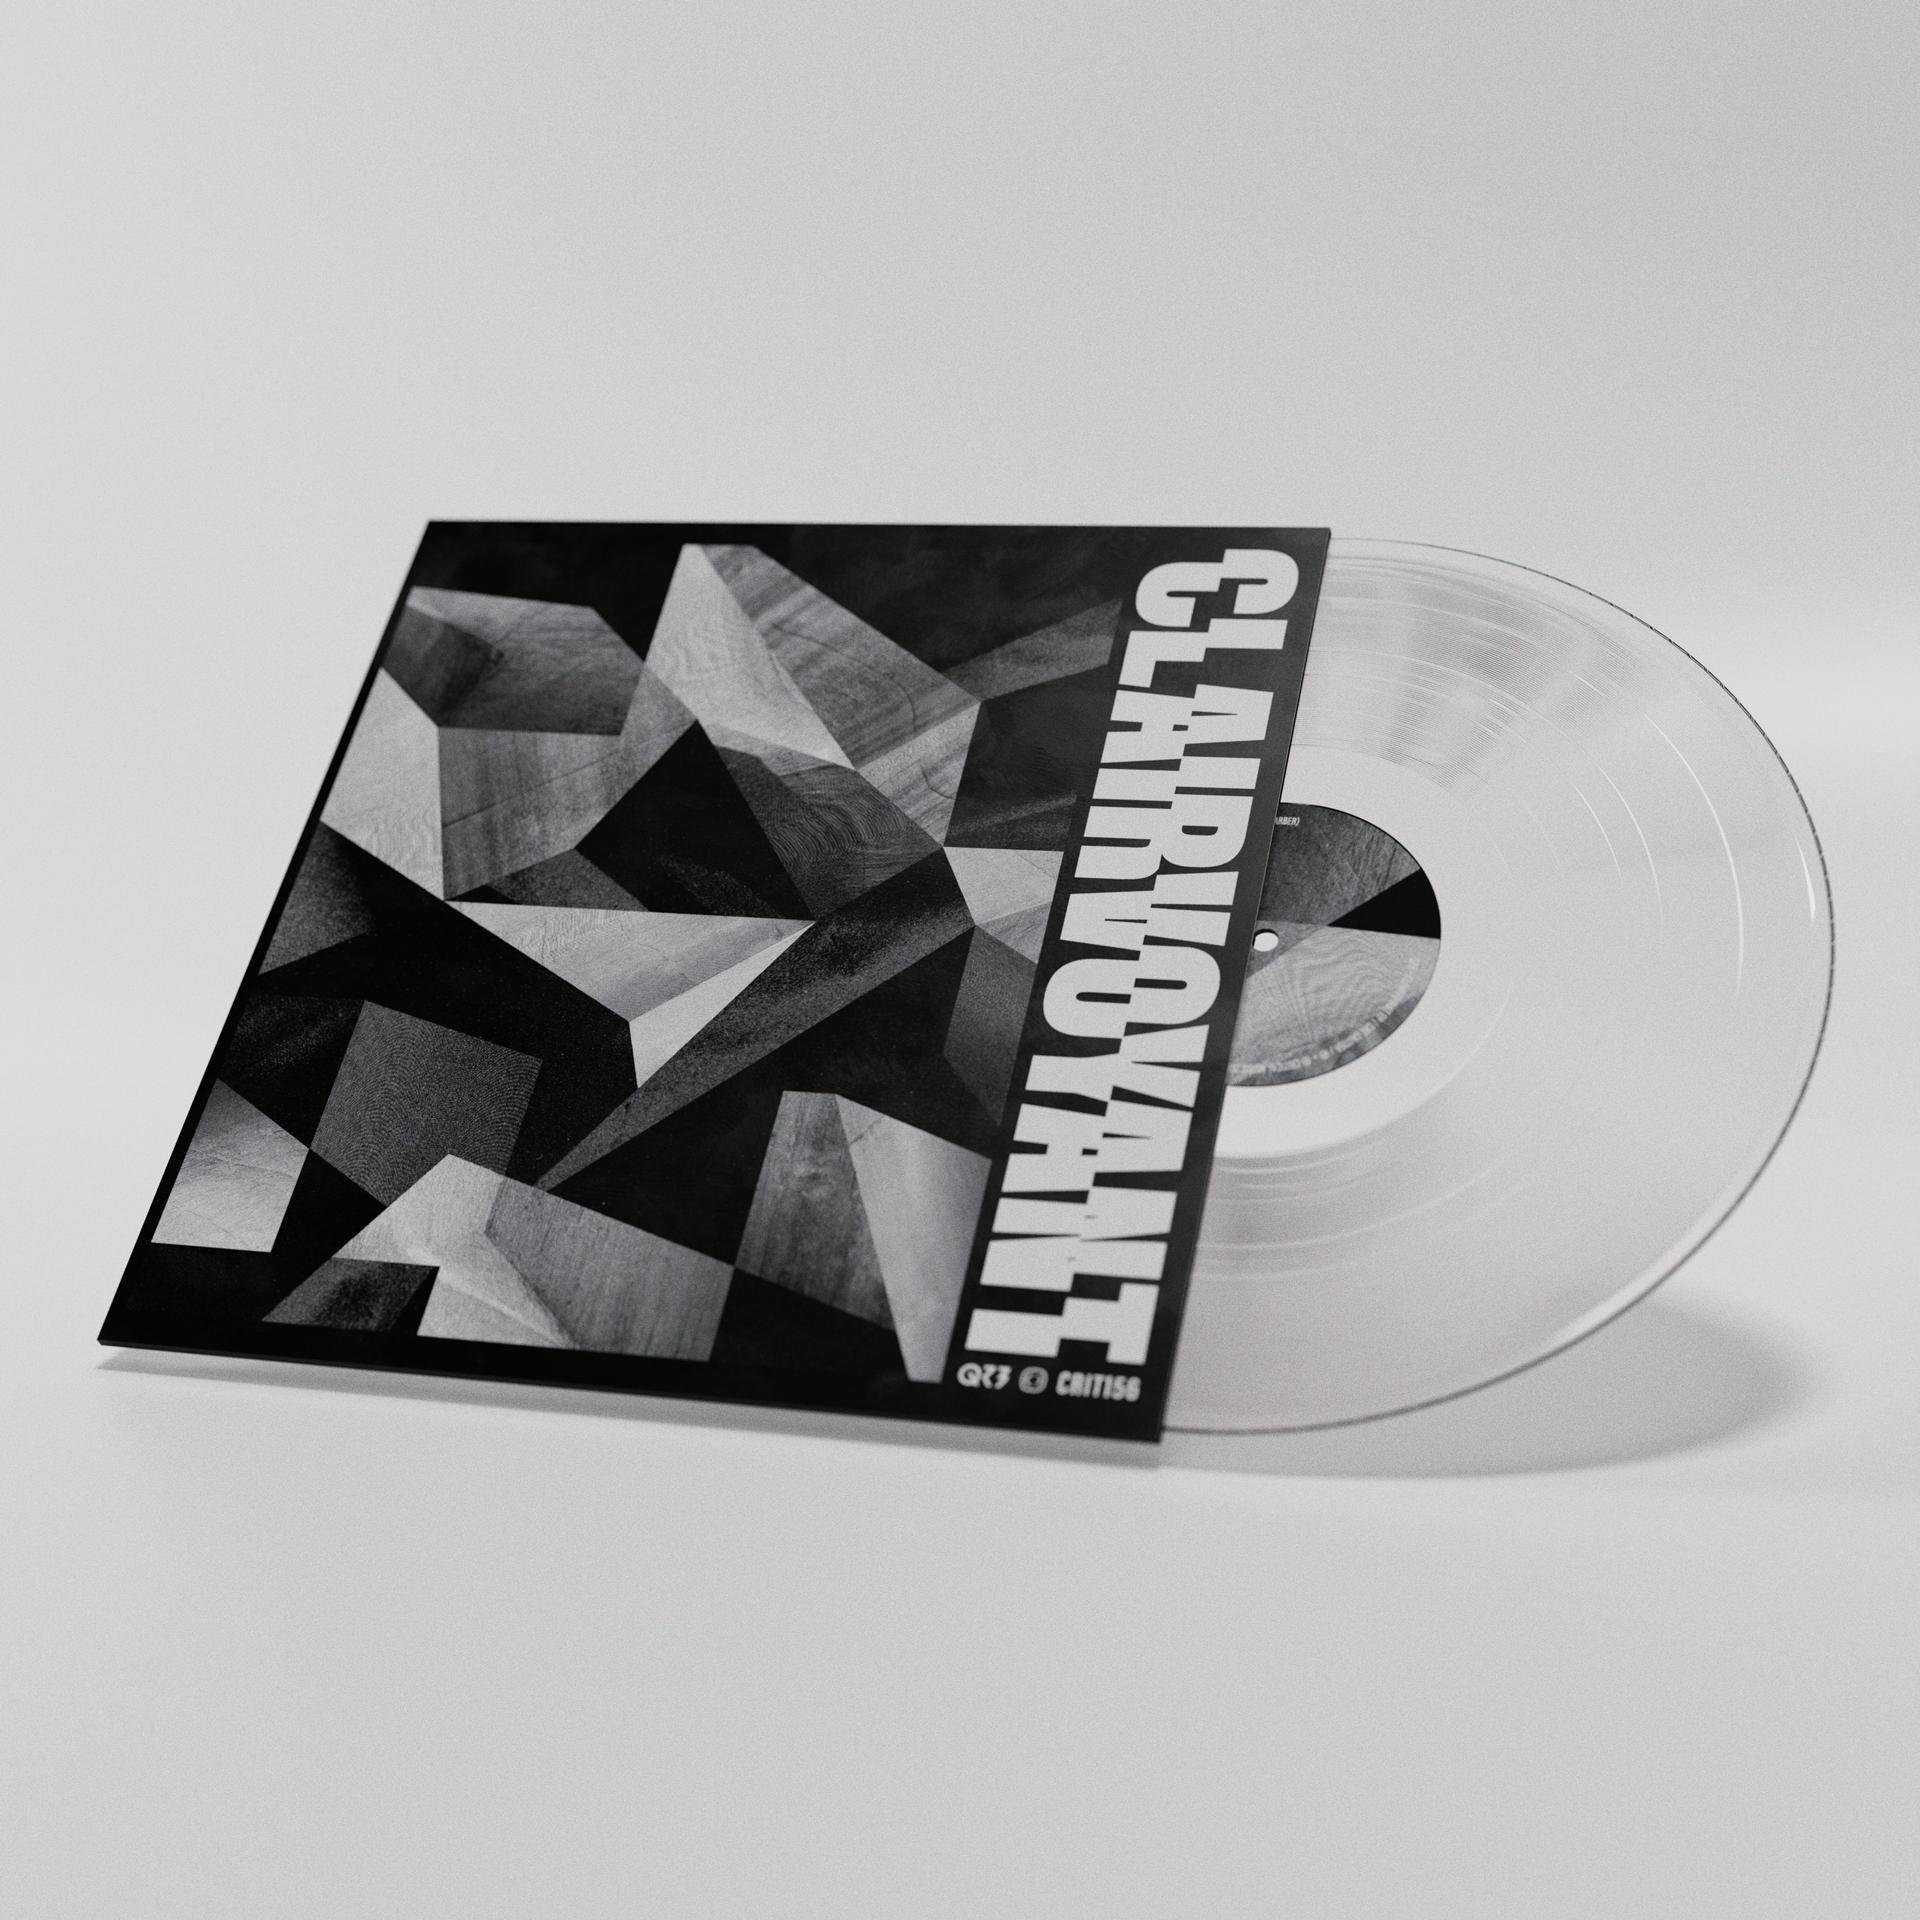 QZB - Clairvoyant EP Image